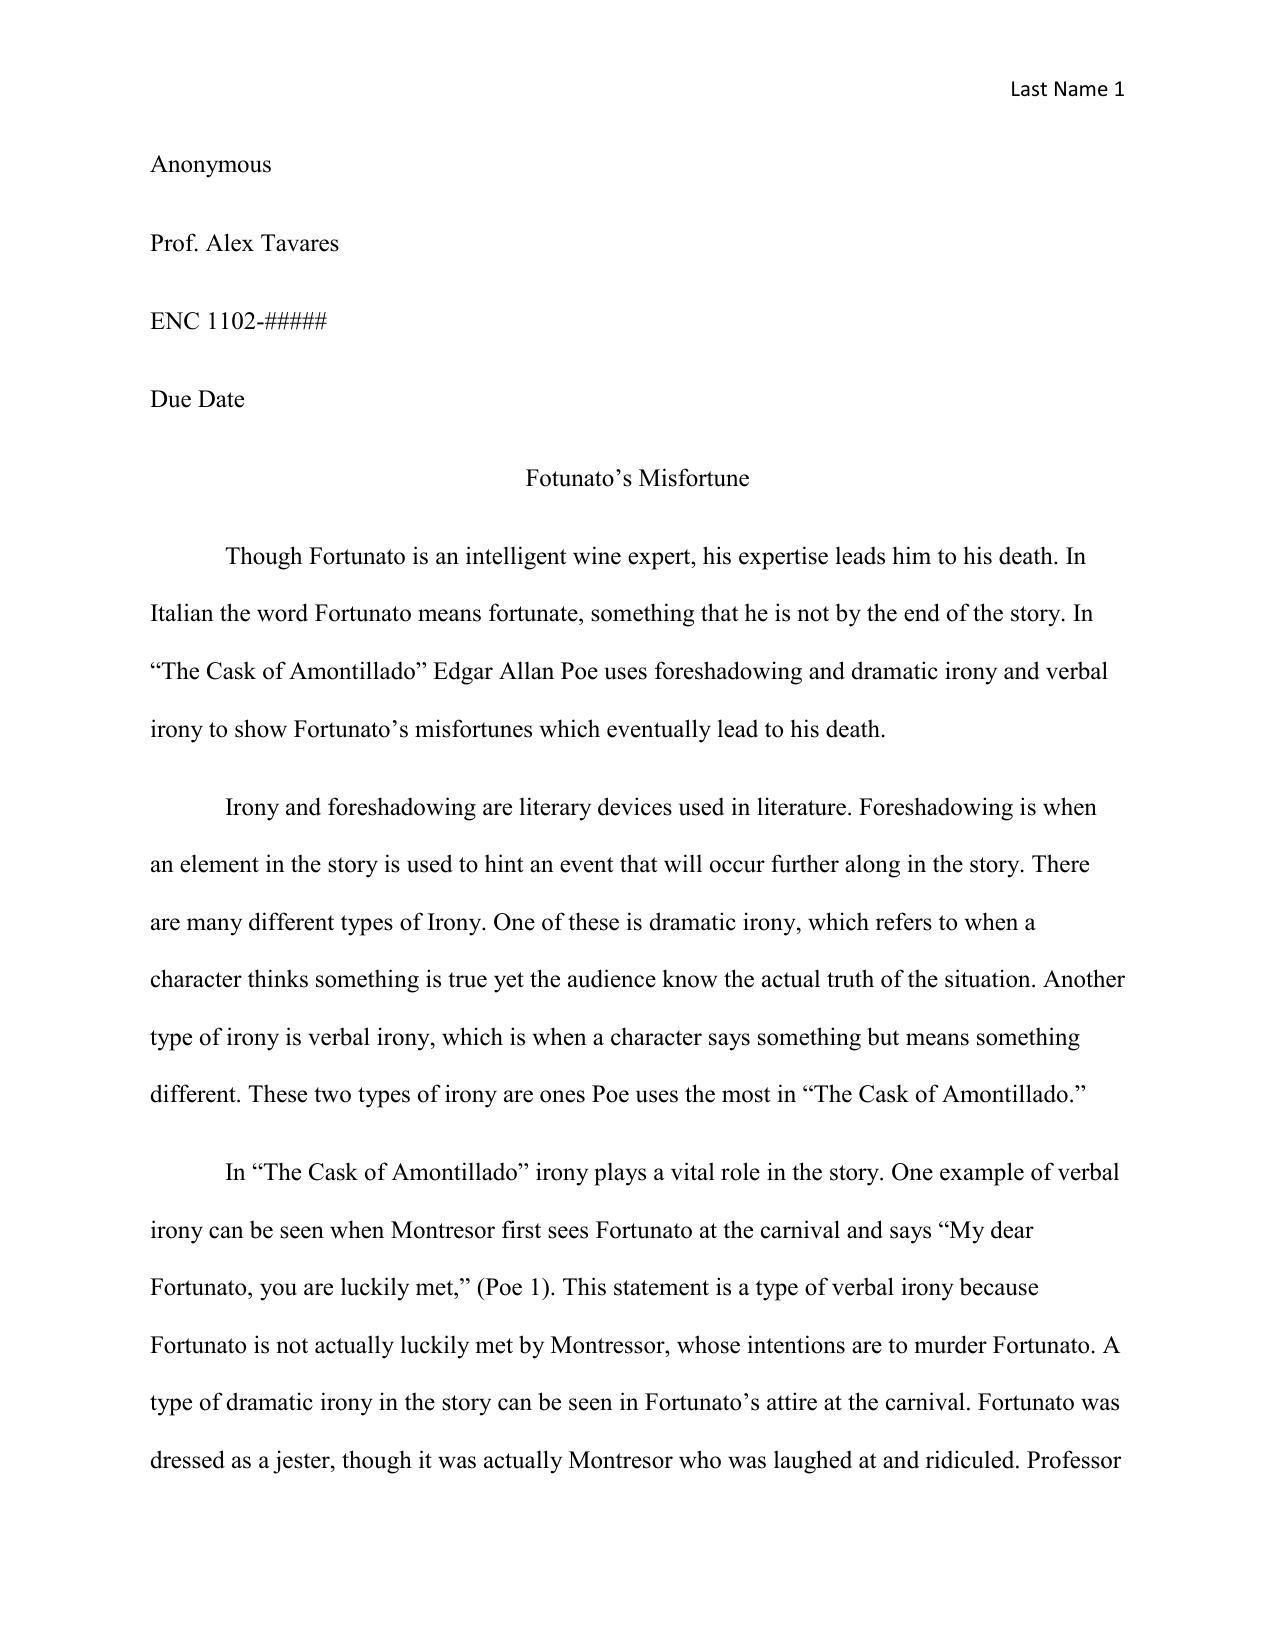 Irony in poes work essay